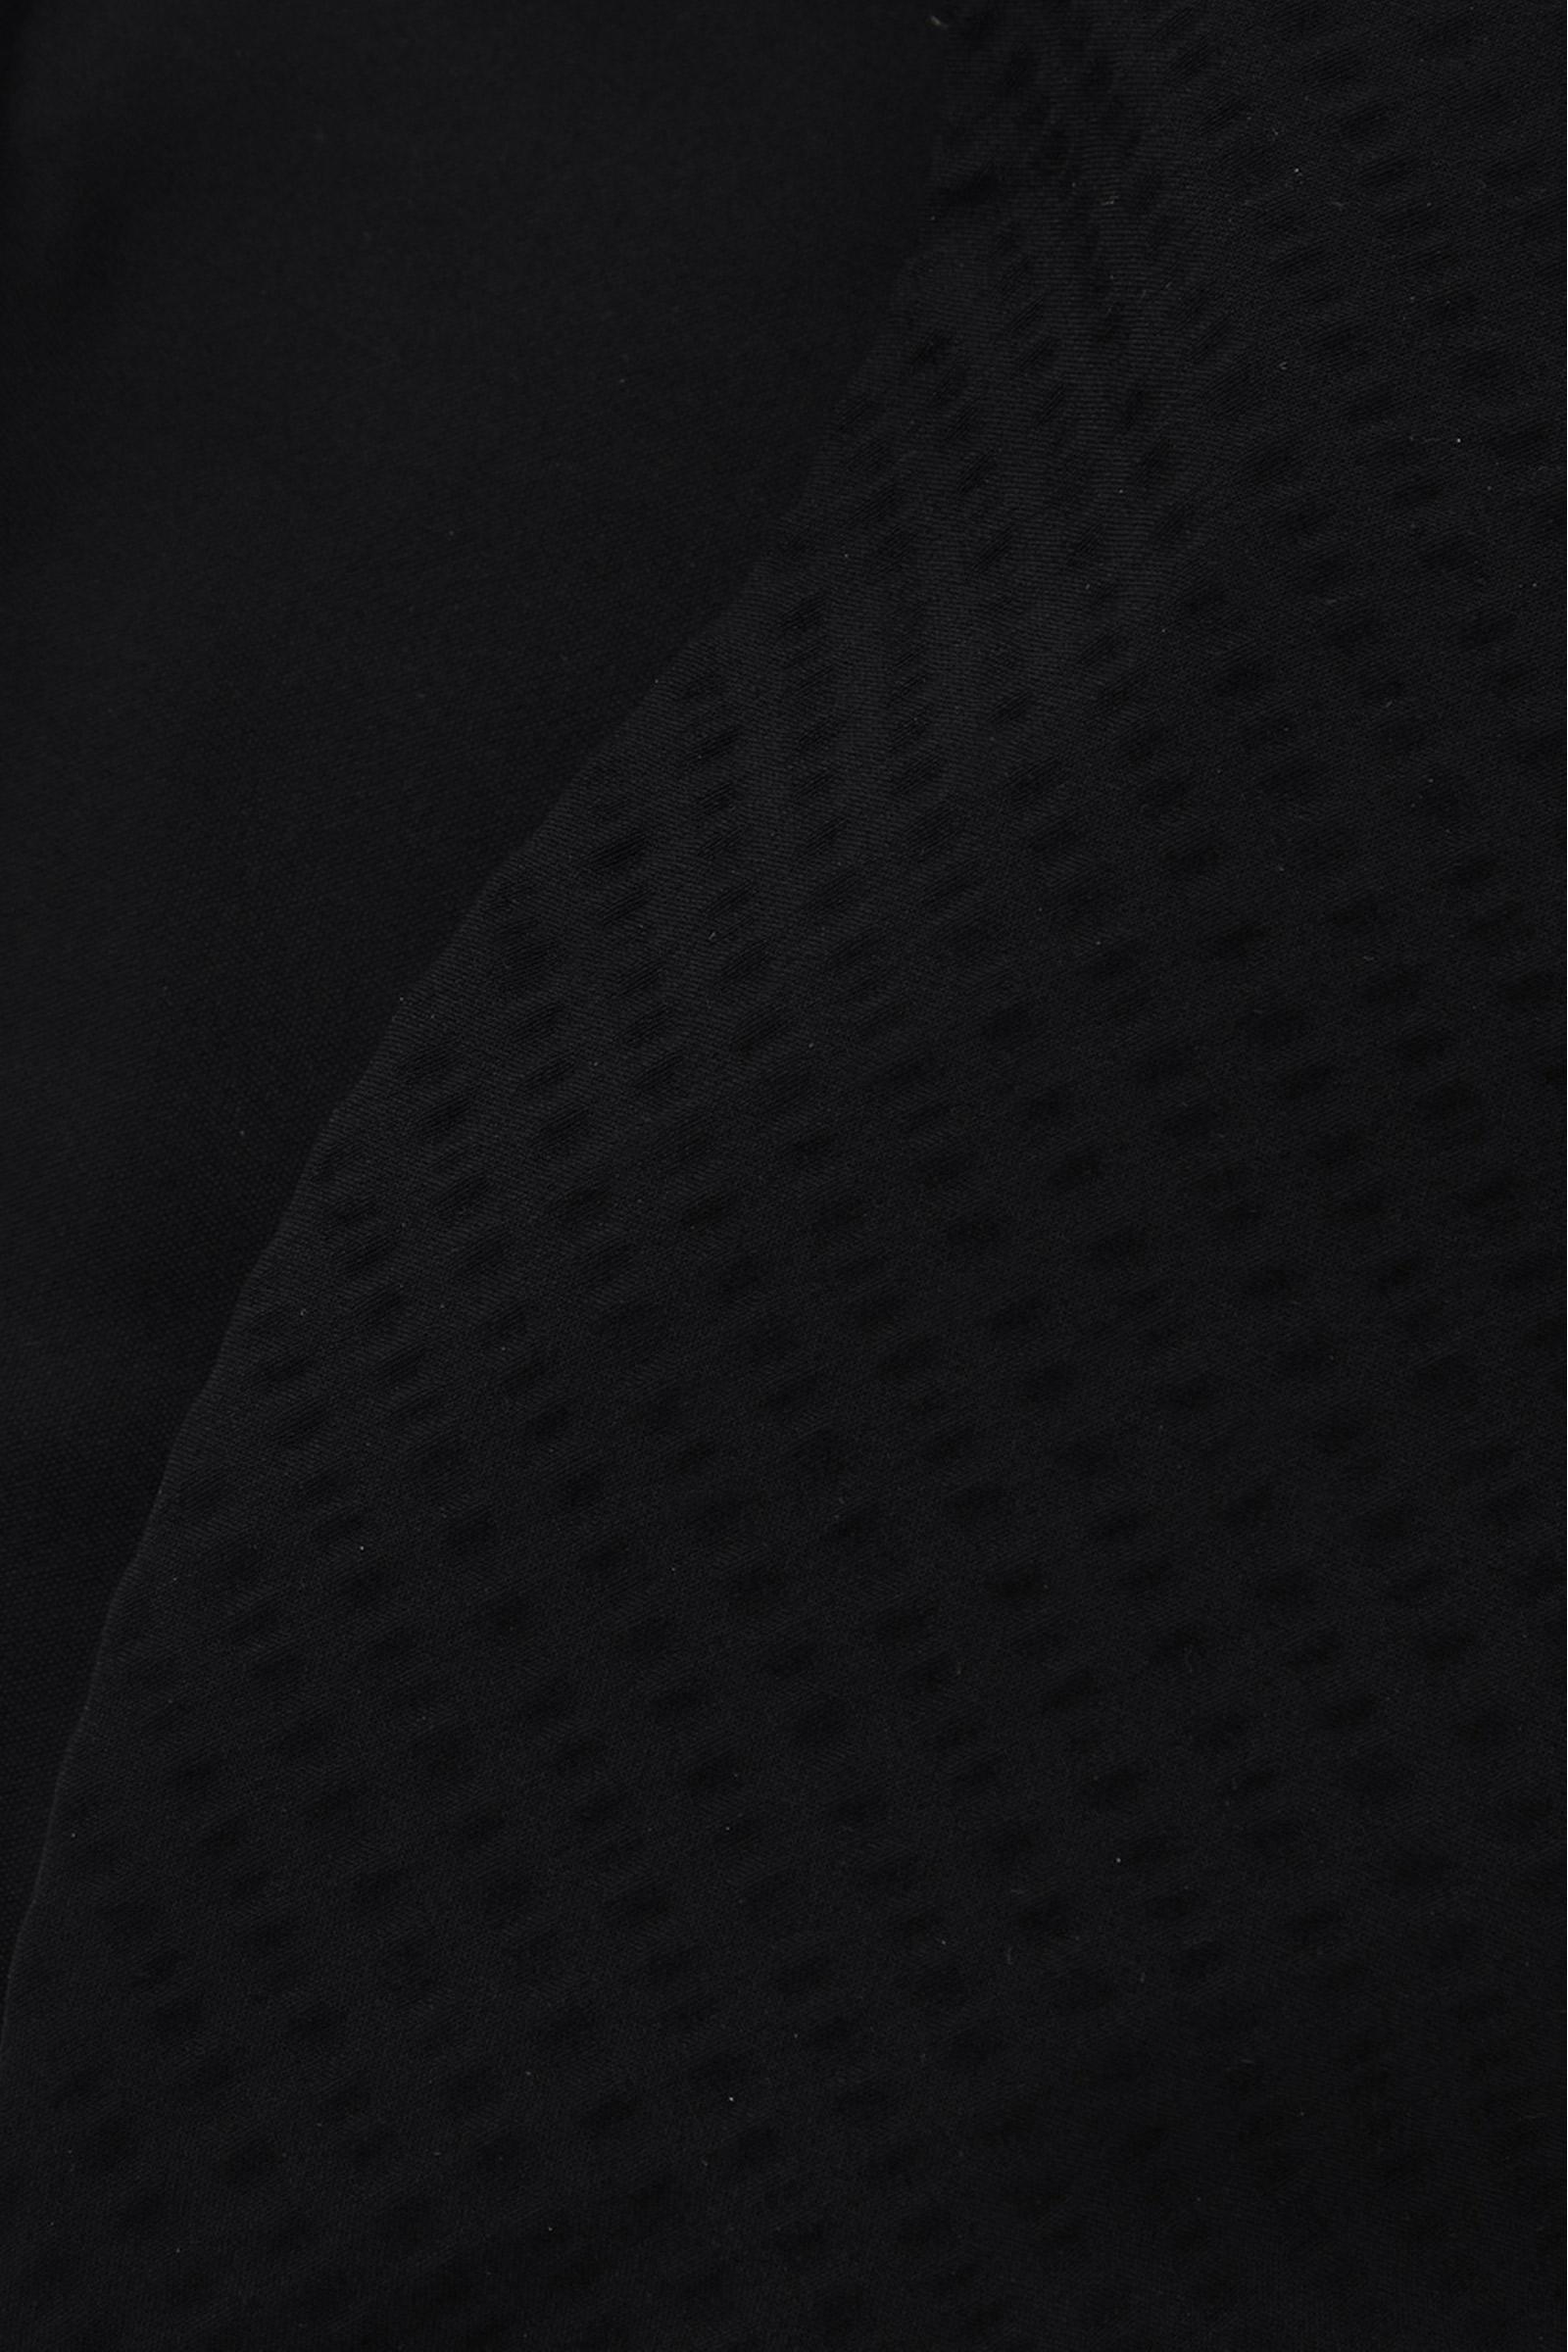 COS 트라이앵글 비키니 탑의 블랙컬러 Detail입니다.